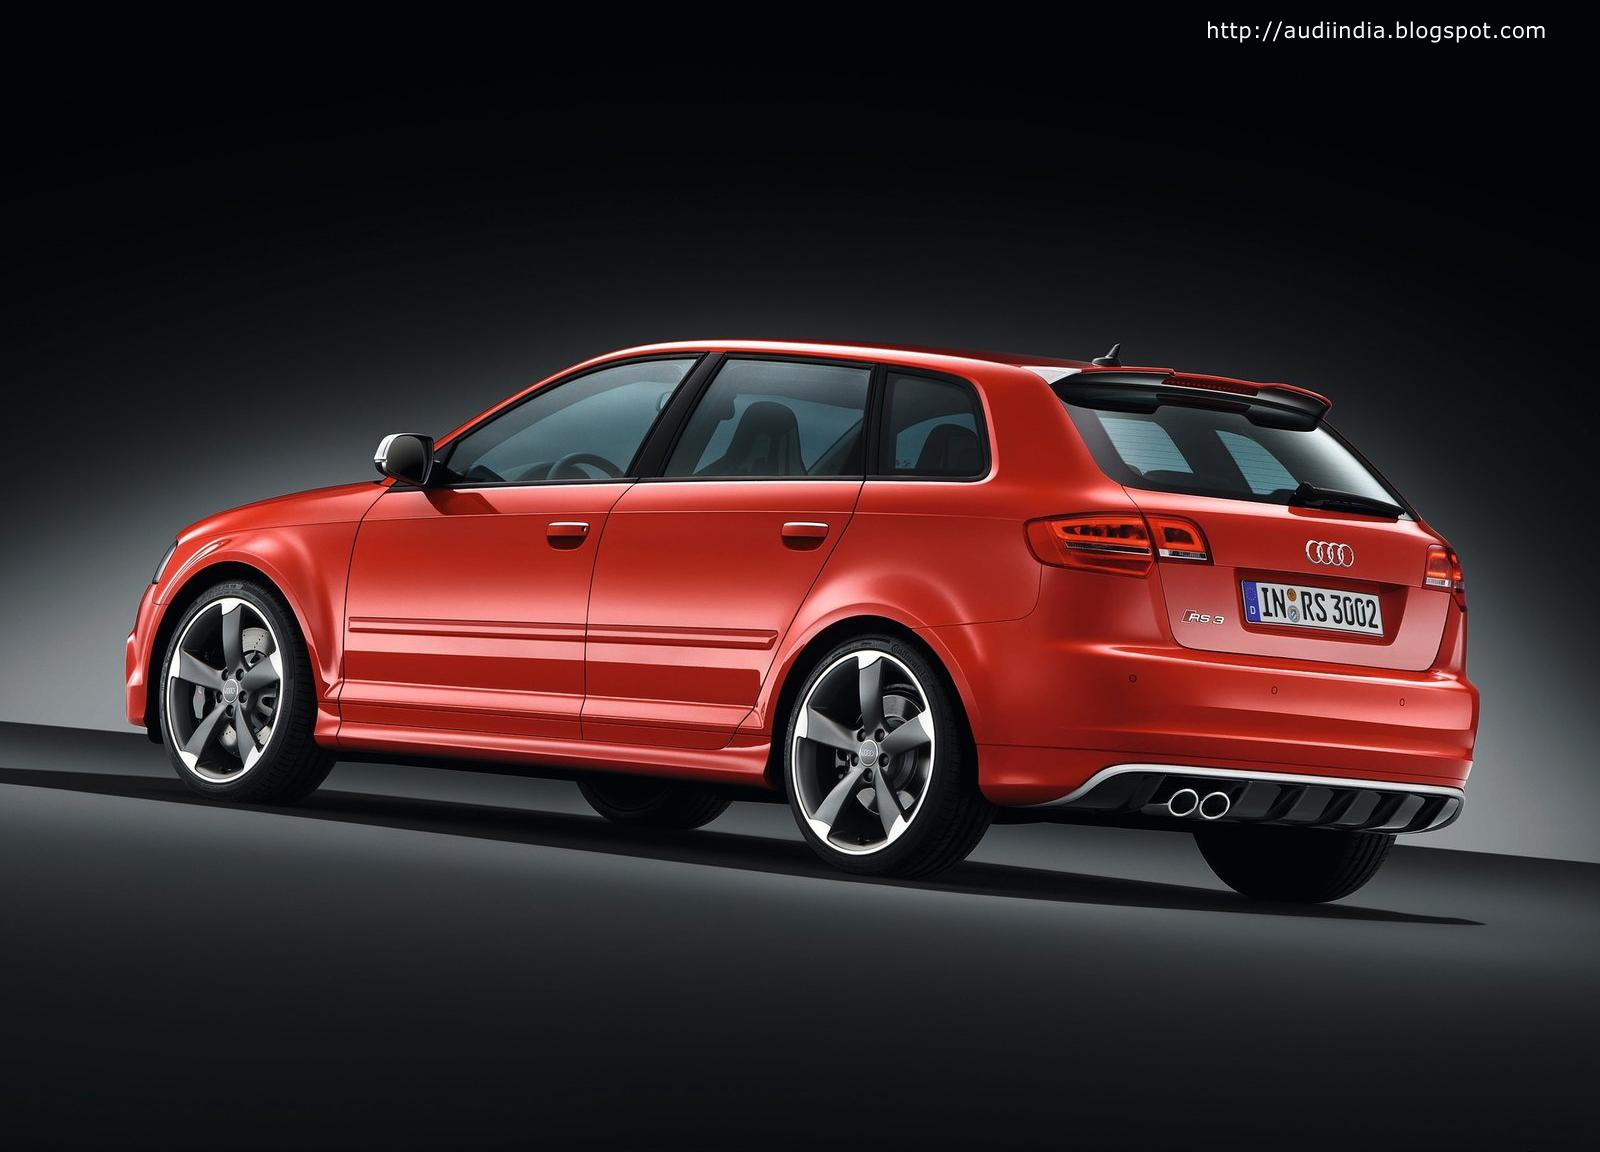 http://2.bp.blogspot.com/-y_fLyhrMs1I/ToqvpdlHfcI/AAAAAAAABjY/dWSkUqvfuAI/s1600/Audi-RS3_Sportback_2012_1600x1200_wallpaper_22+copy.jpg